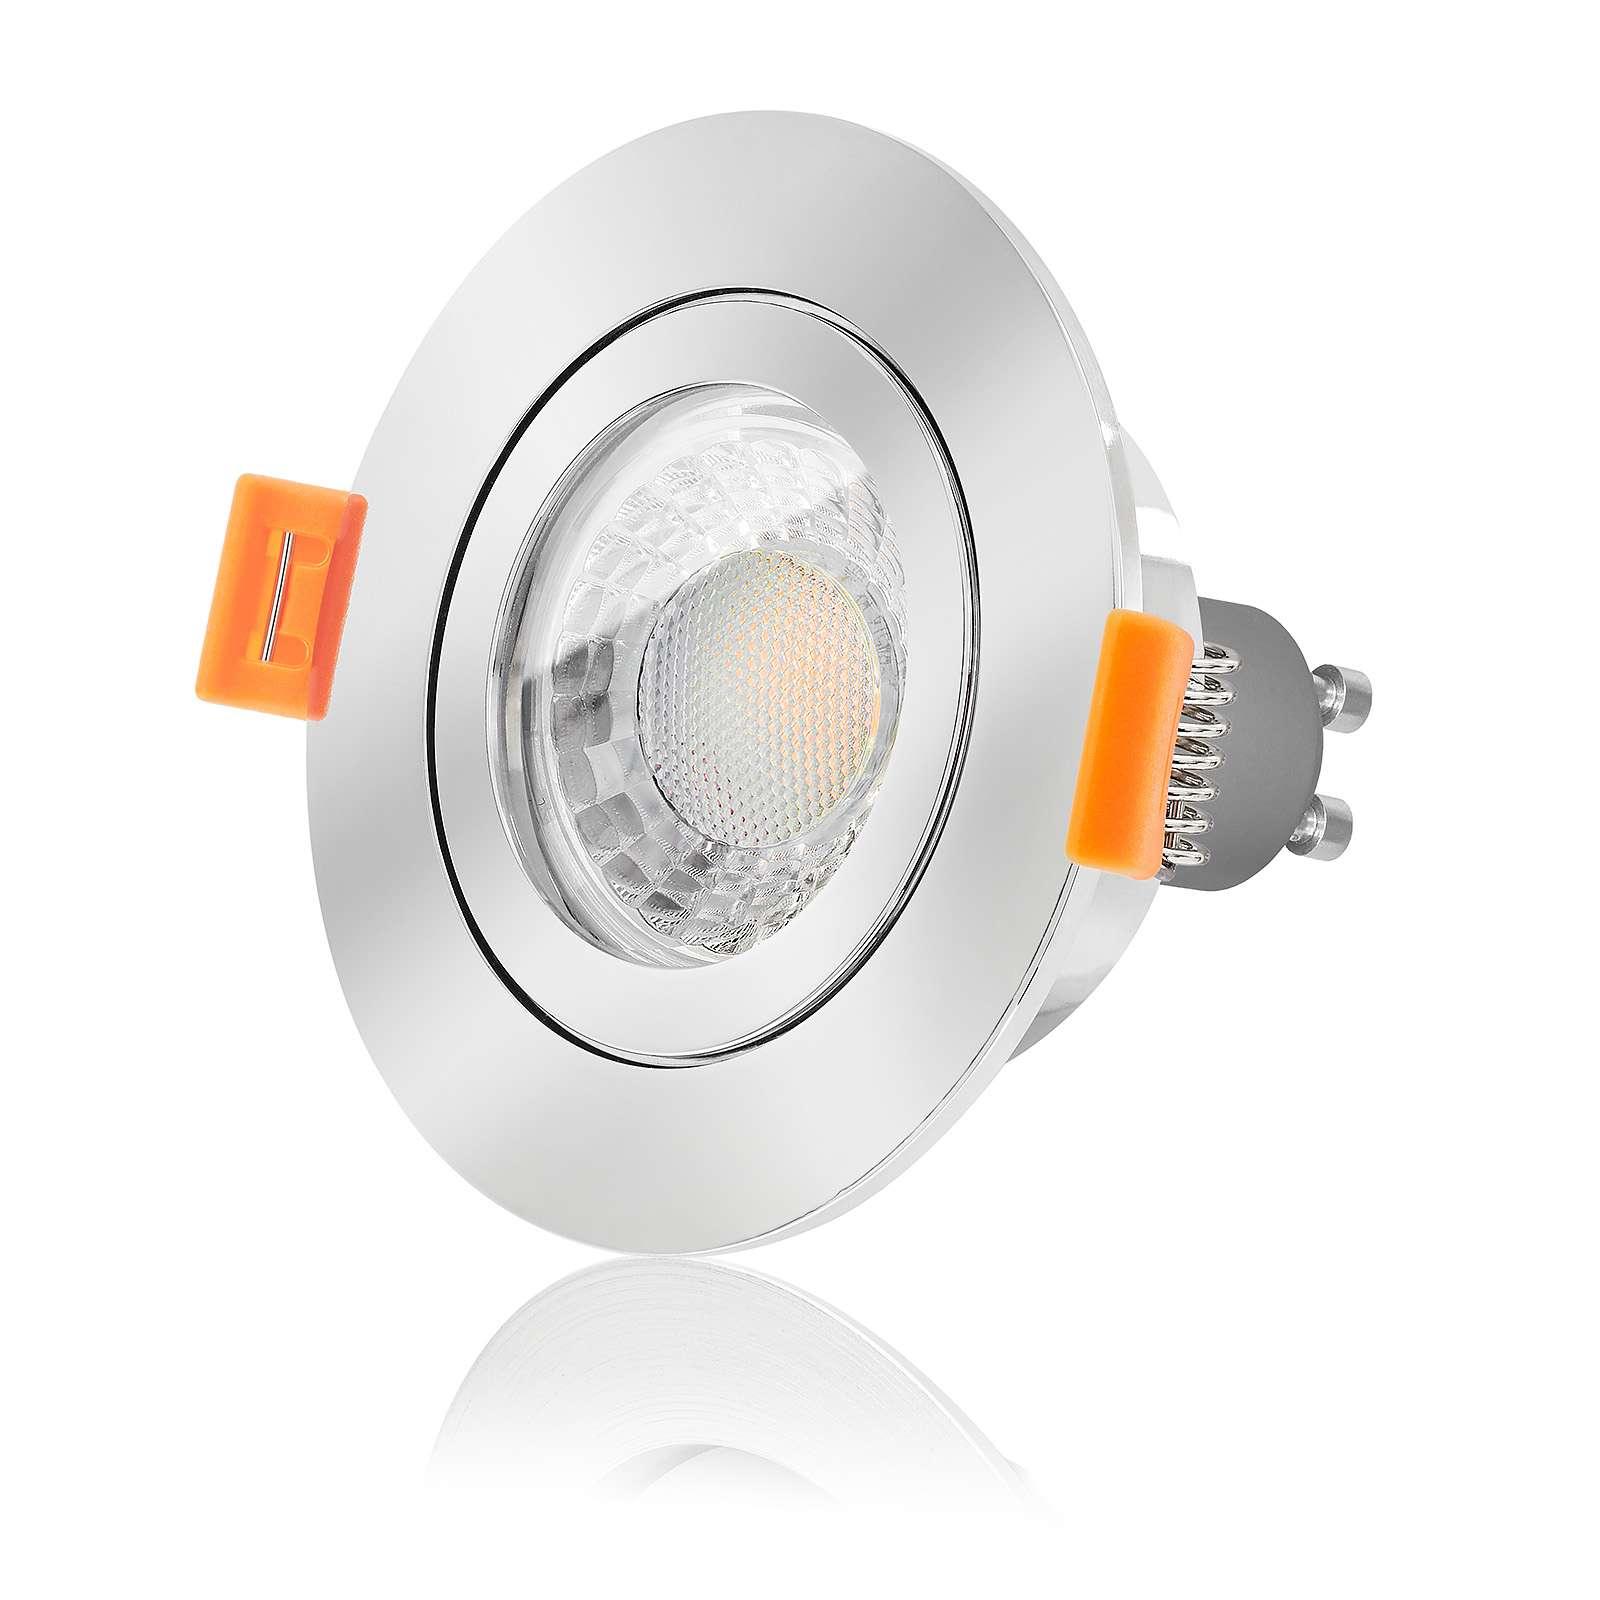 7W LED warmweiß GU10 230V DIMMBAR LED-Einbaustrahler Echtglas Leuchte rund